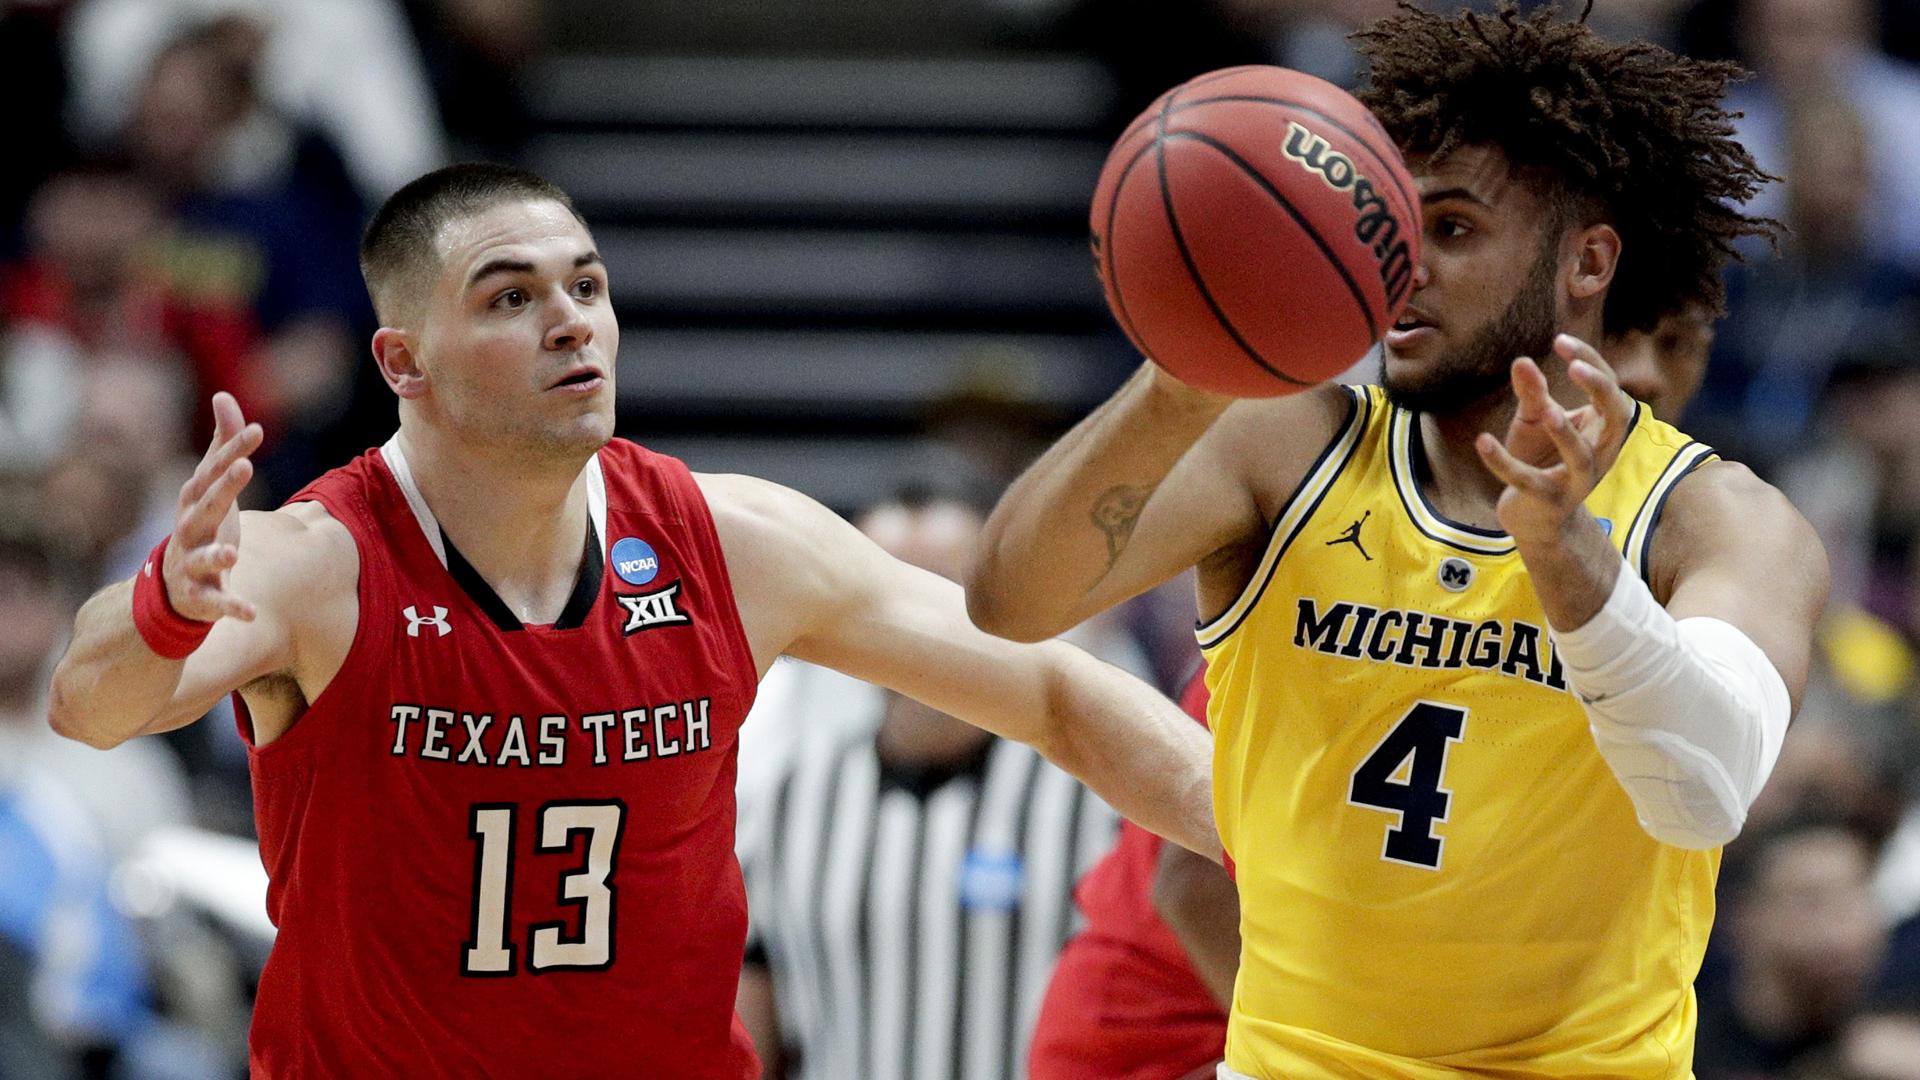 Michigan Texas Tech NCAA Tournament 032819 AP_1553827316379